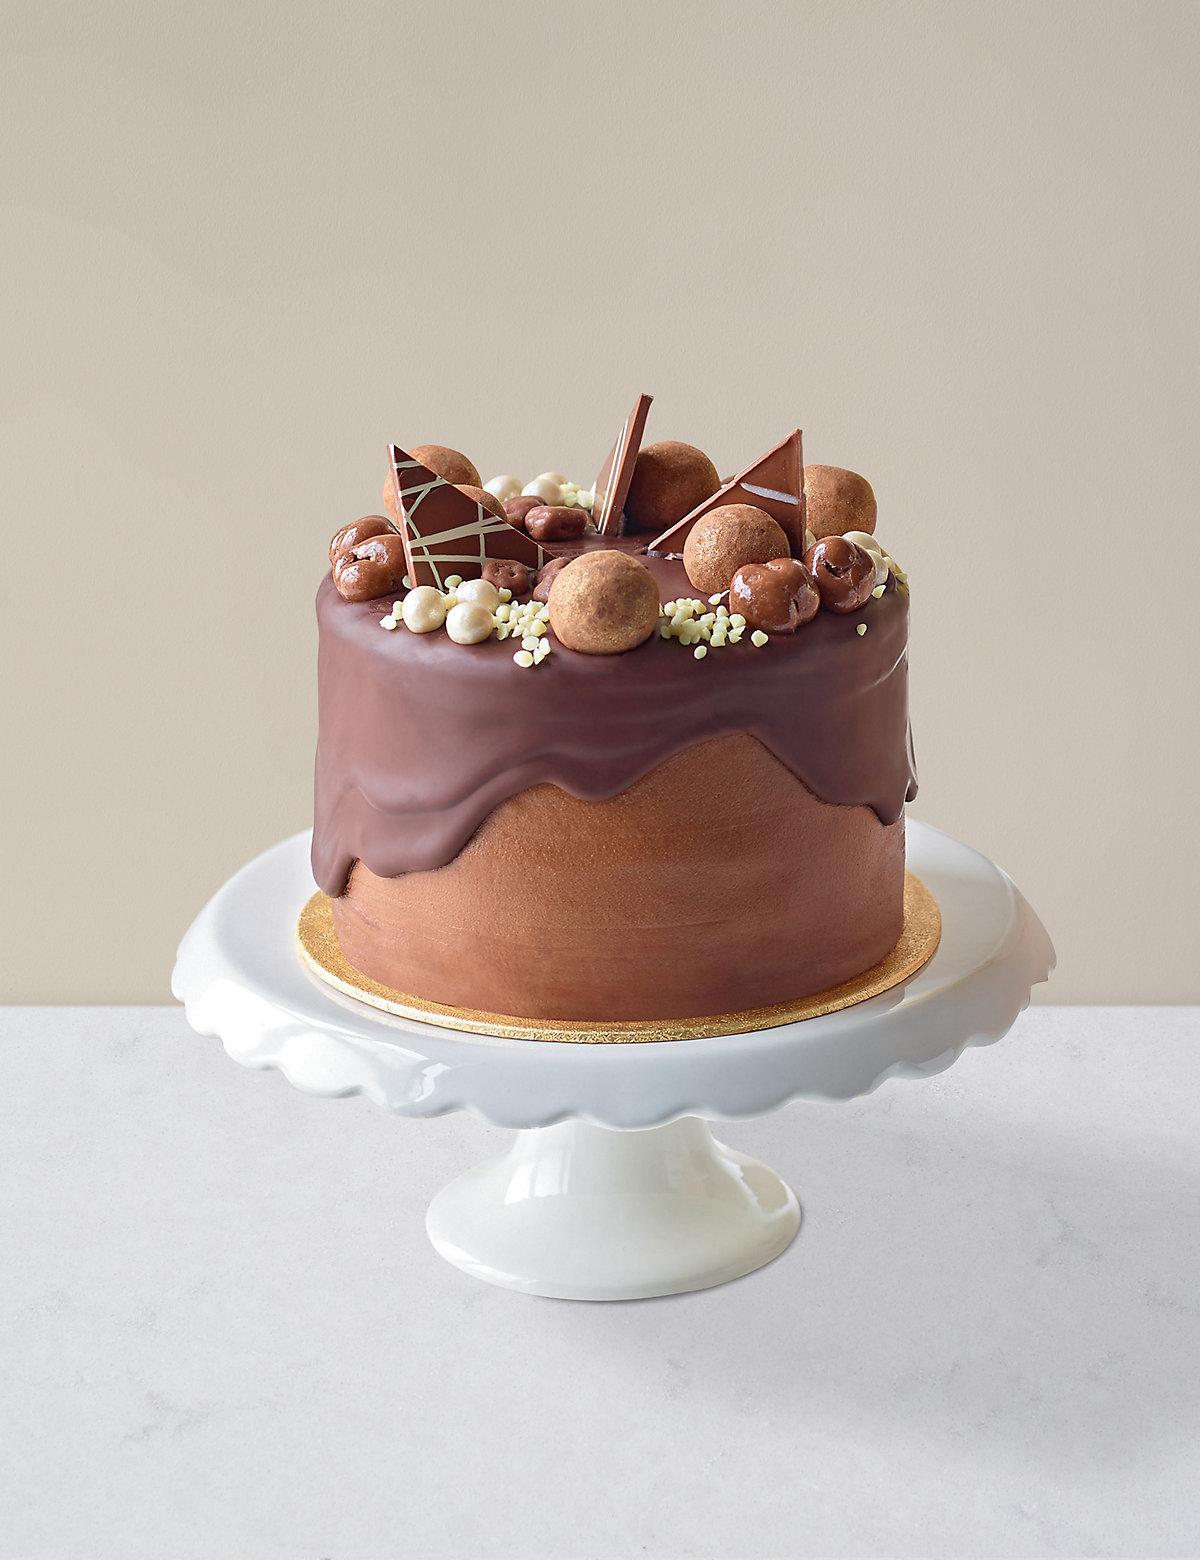 Chocolate & Caramel Dribble Cake